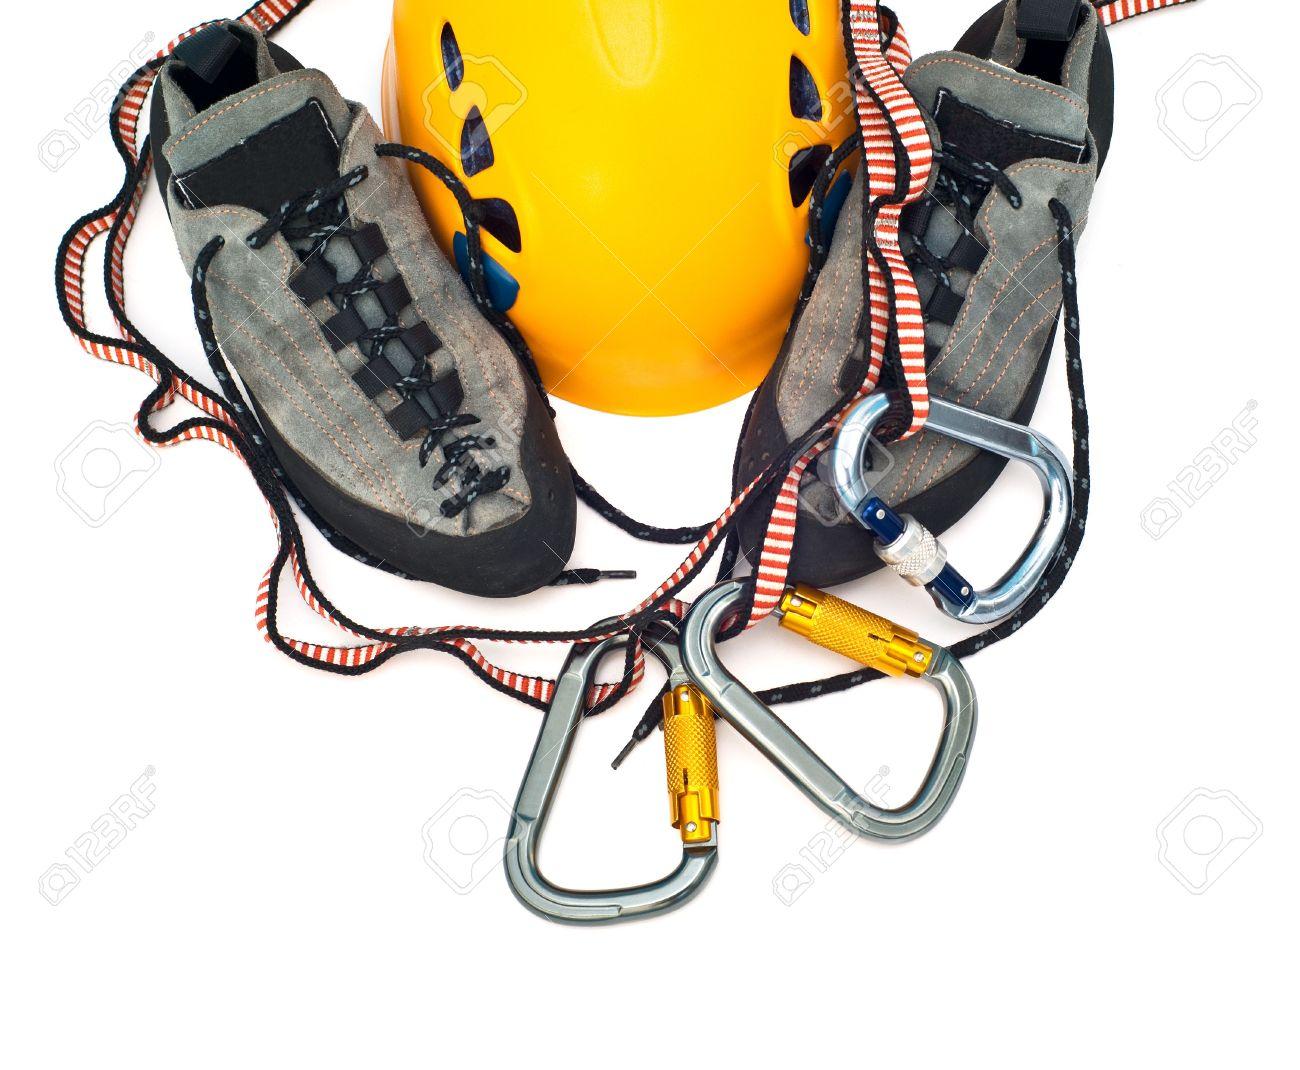 climbing gear - carabiners, orange helmet, rope, grey shoes Stock Photo - 5637474